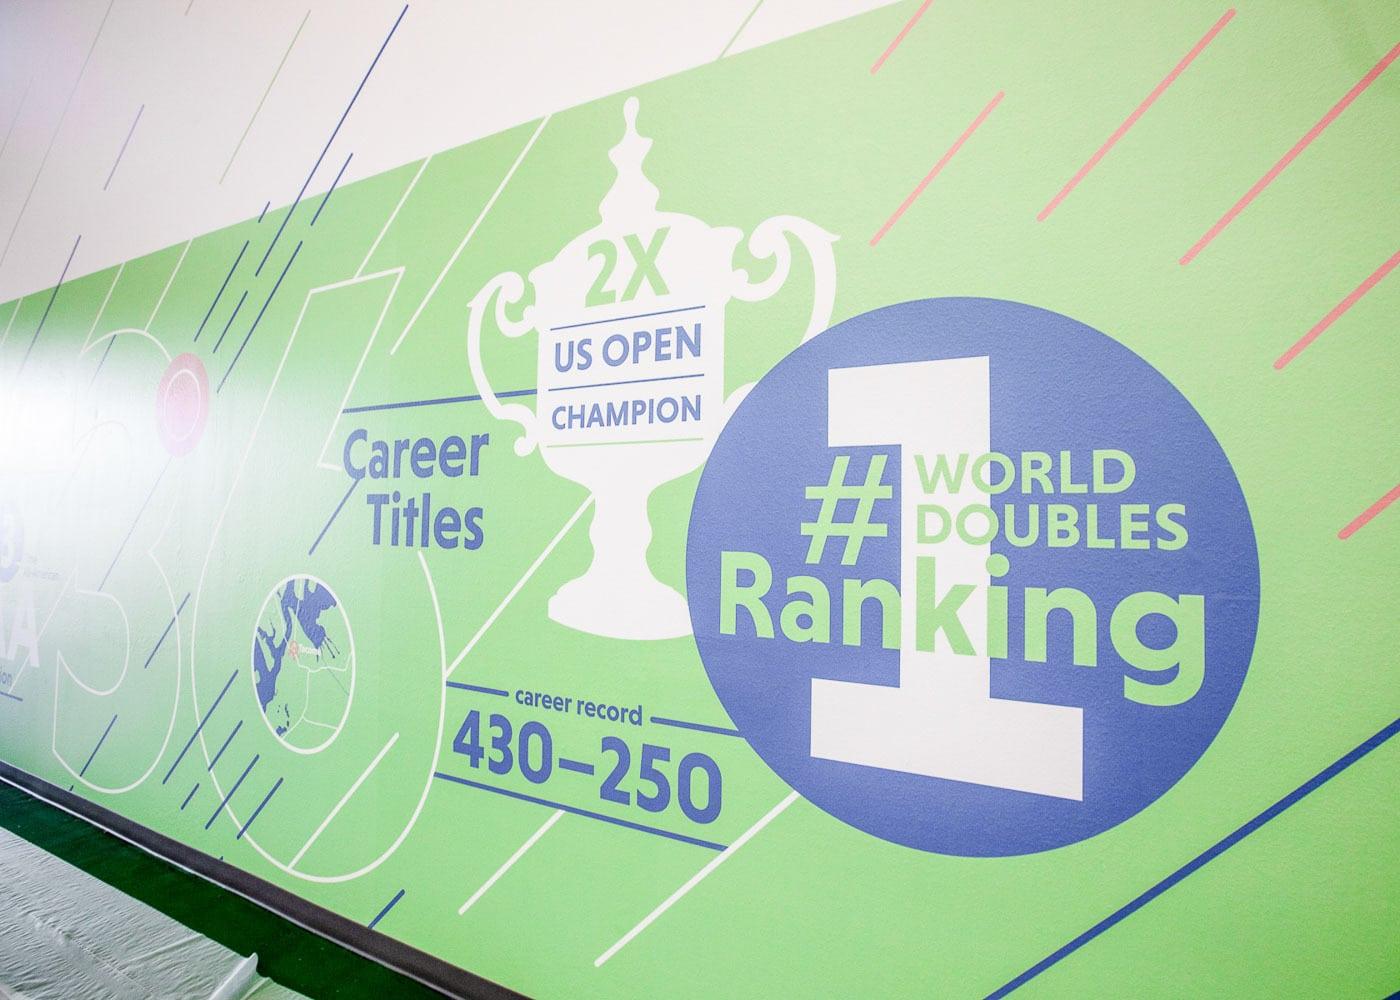 Patrick Galbraith tennis career wall Tacoma